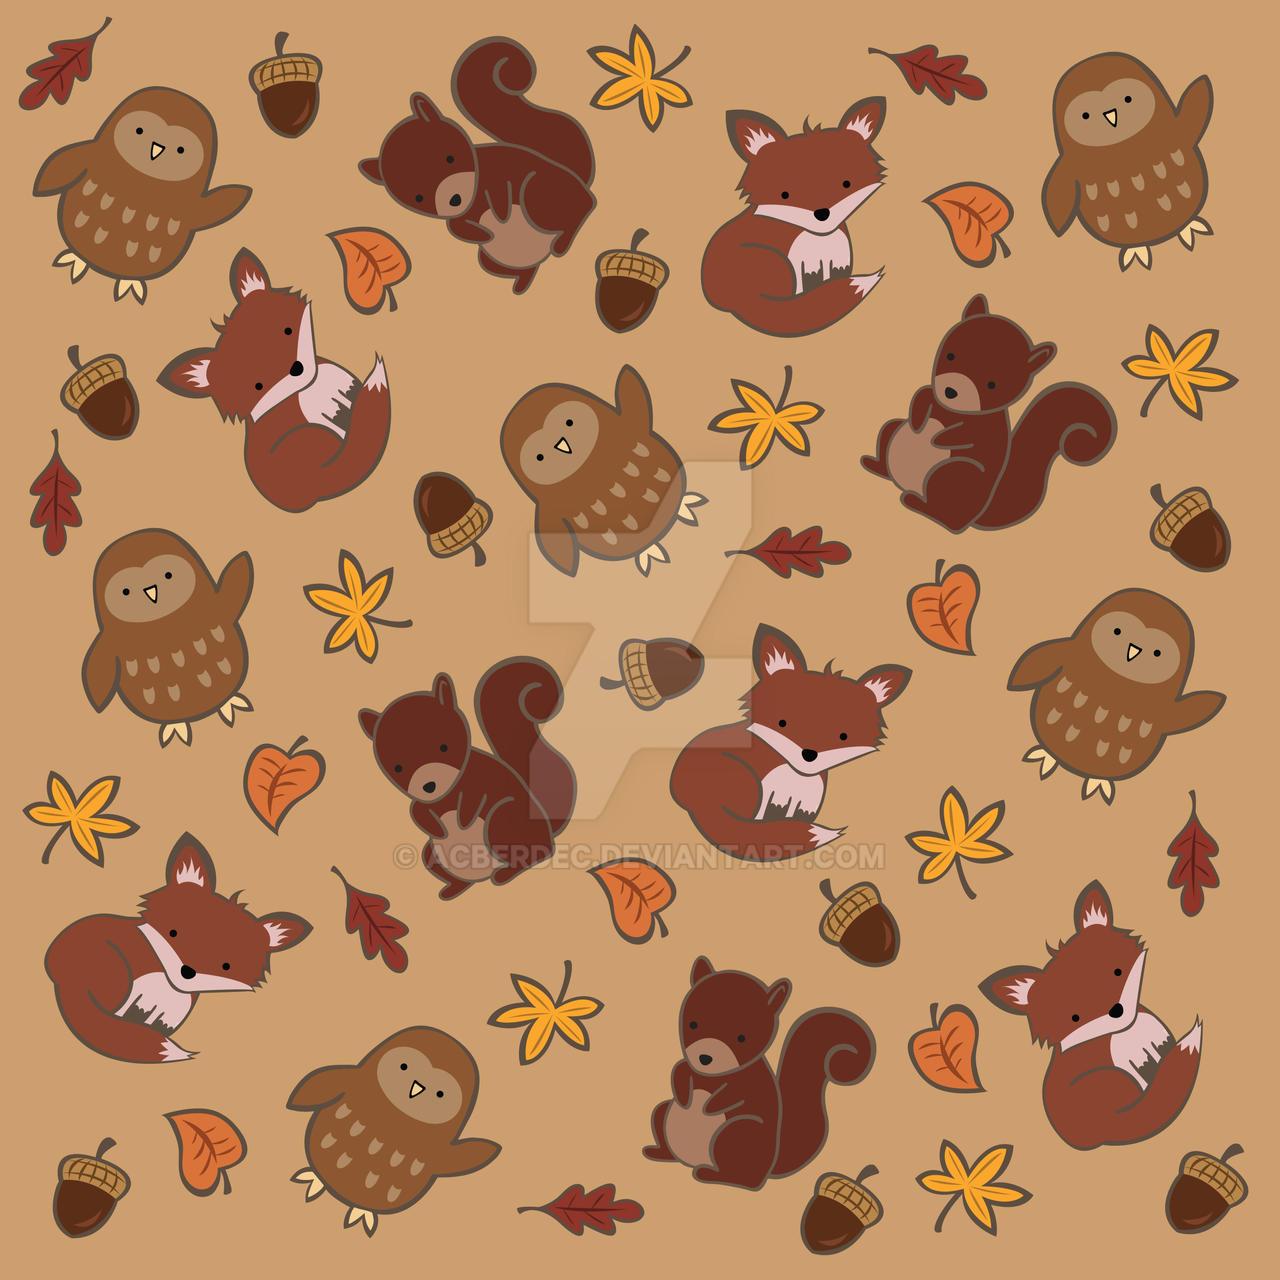 cute fall fashion design images